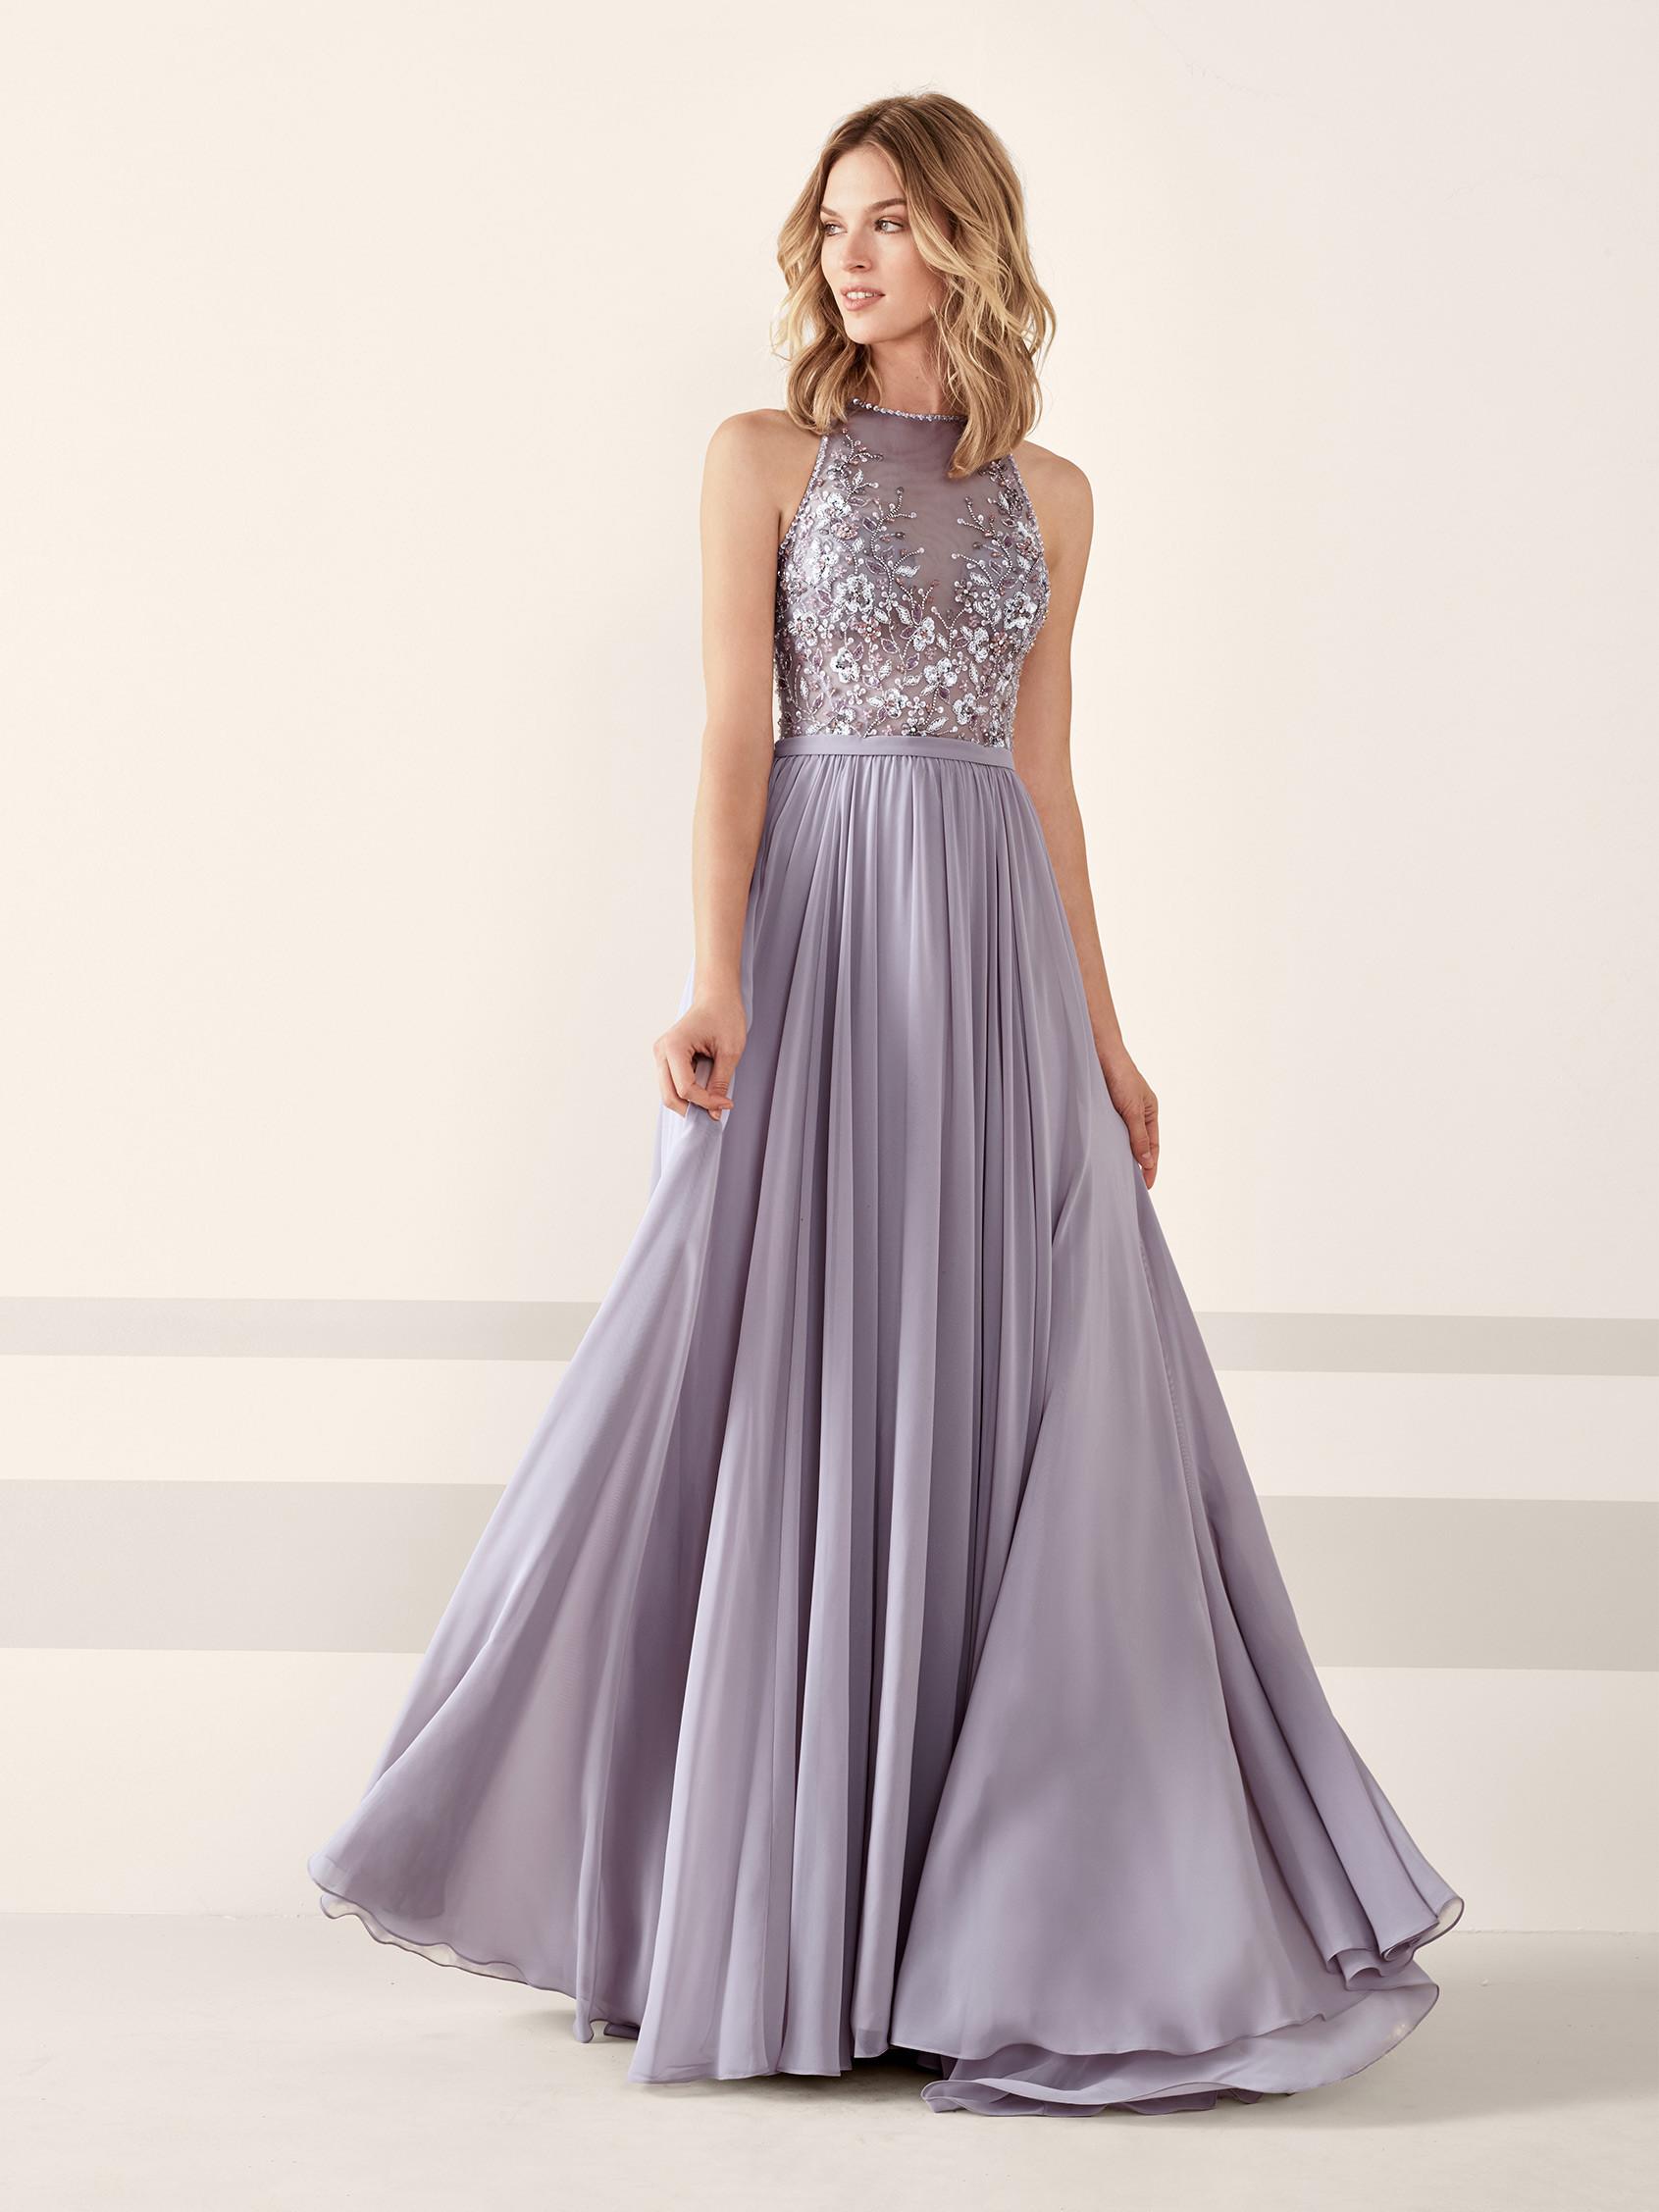 332fb0be0 Vestidos largos liz minelli 2019 - Elegante vestido de moda de ...